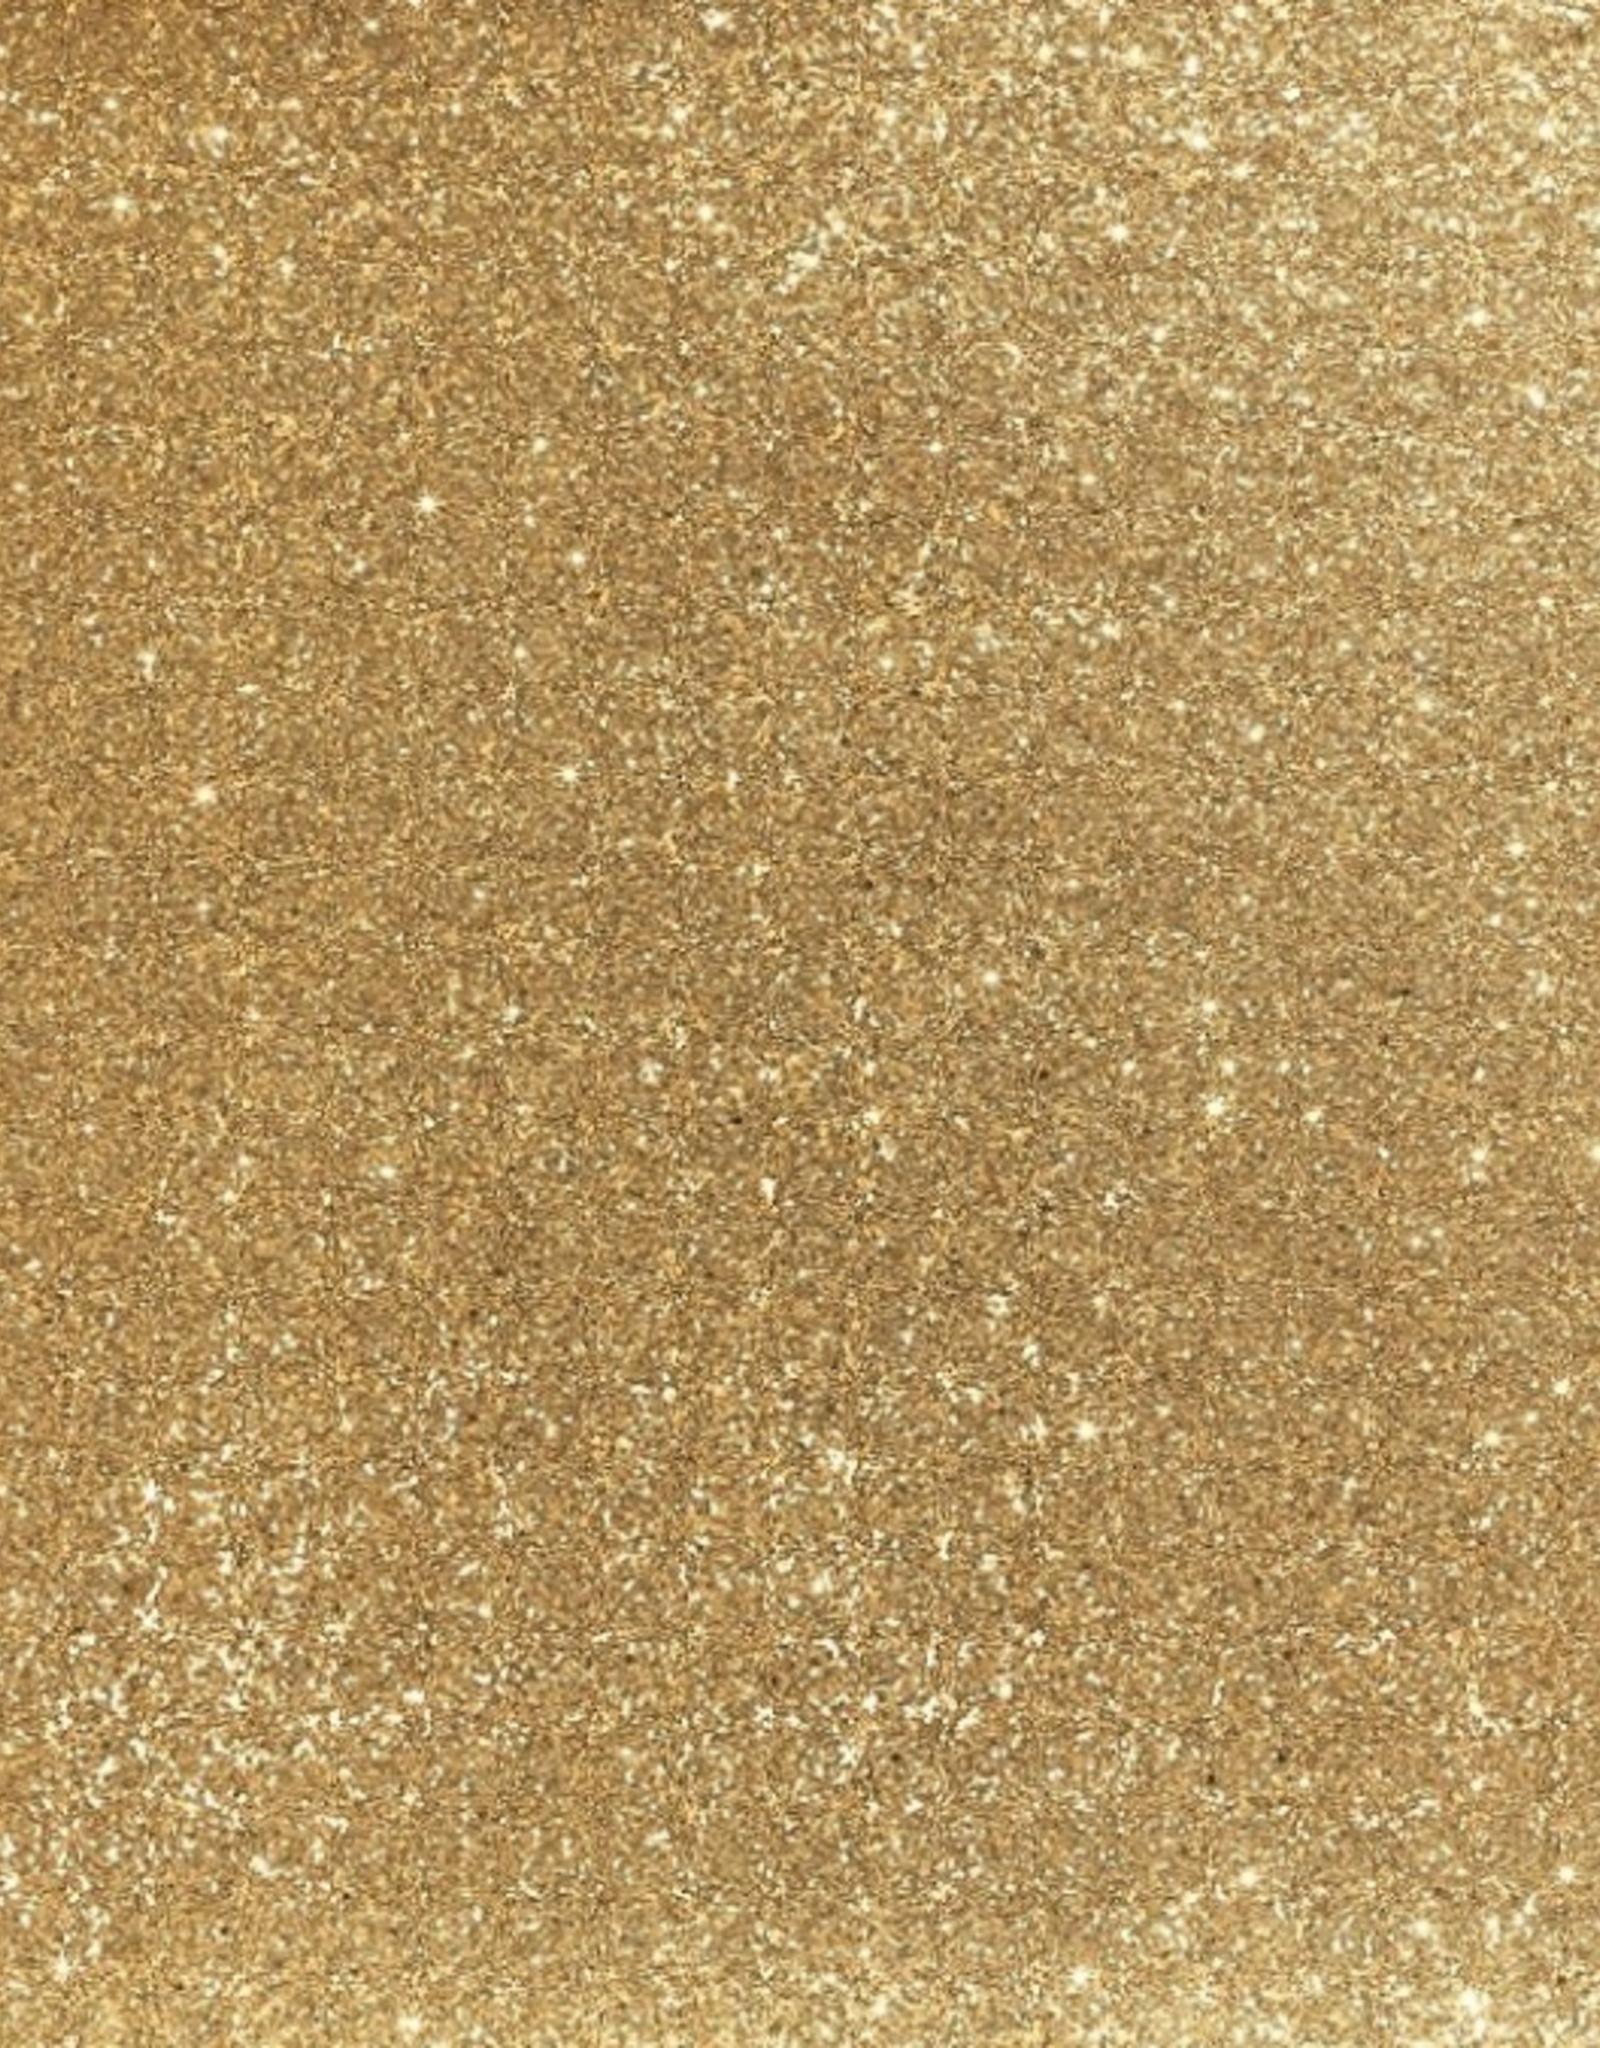 Vouwtres 20mm - Glitter Goud